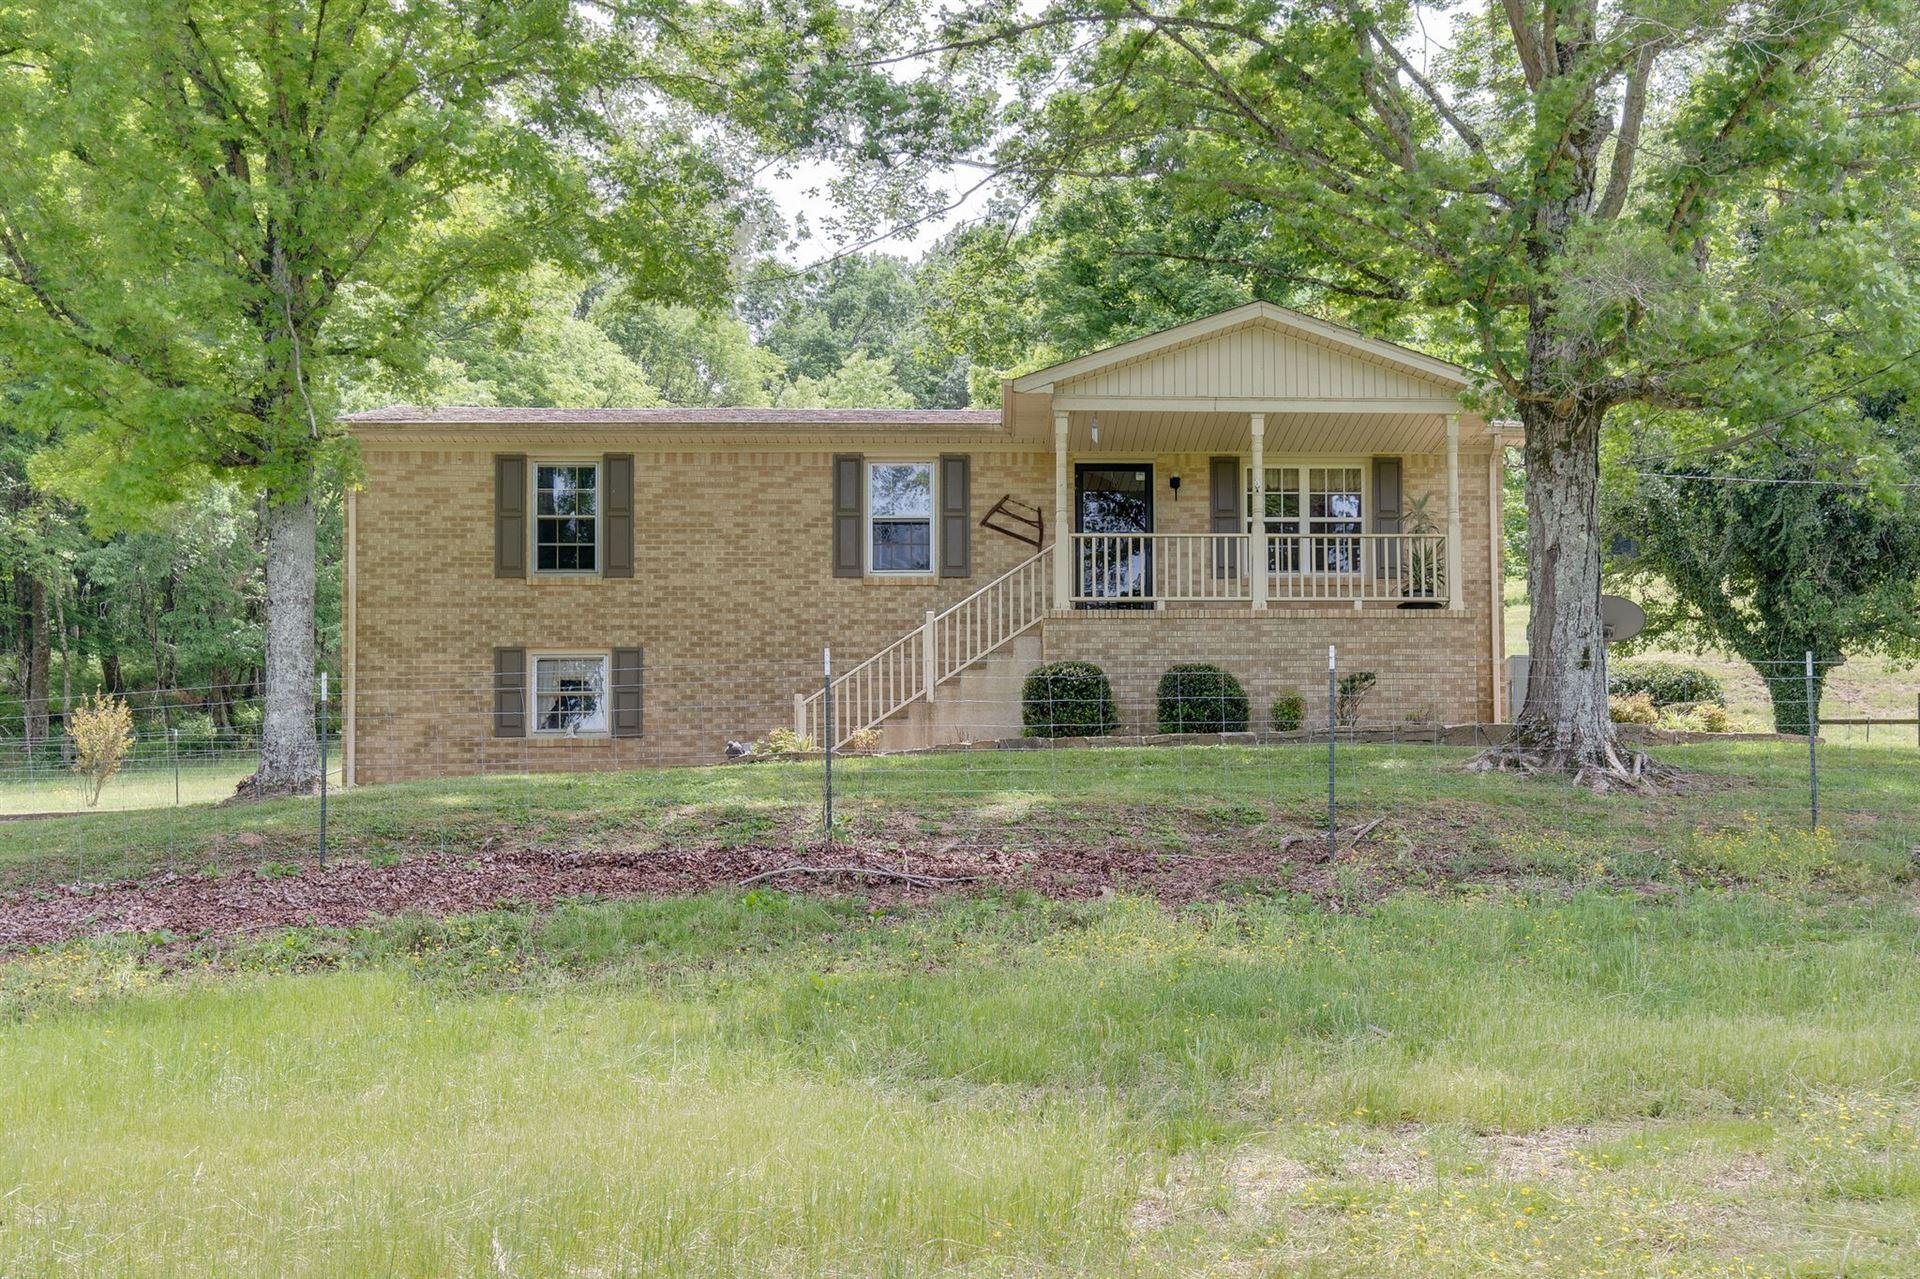 Photo of 1345 Lynn Creek Rd, Lynnville, TN 38472 (MLS # 2255975)